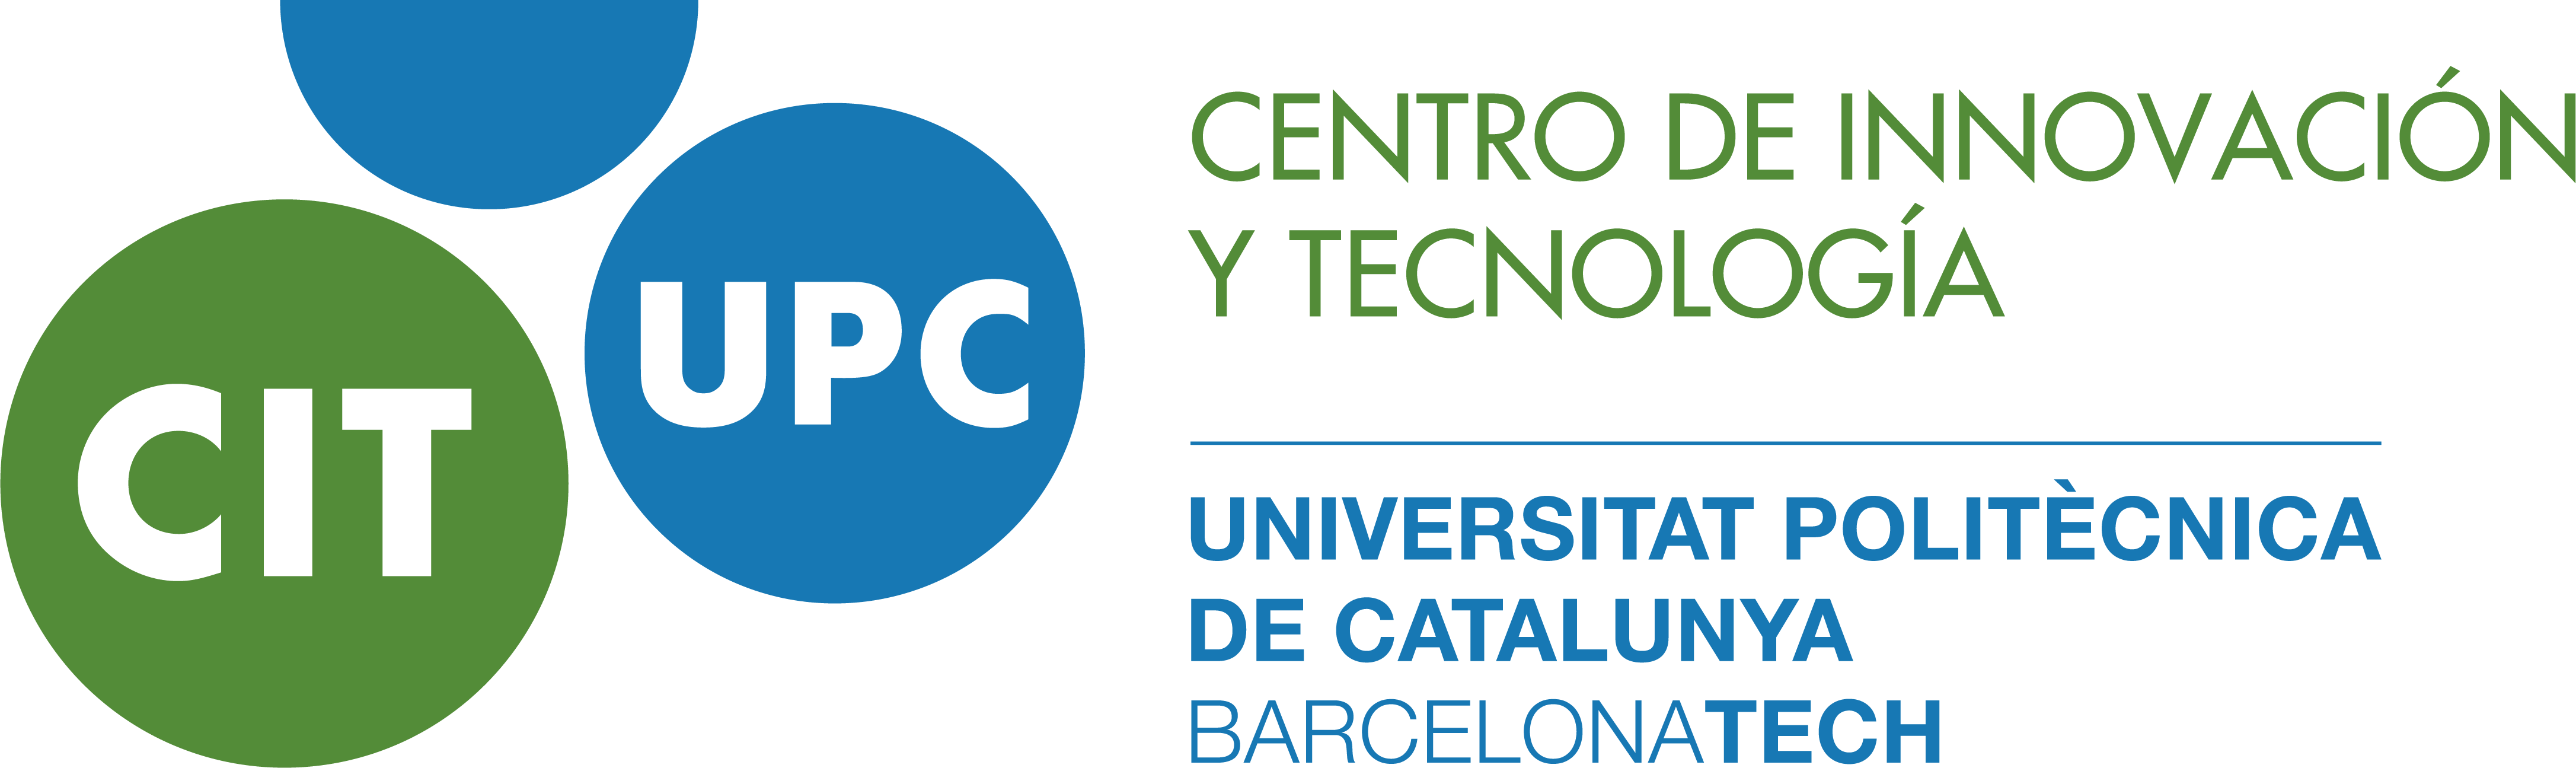 logo_positiu_horitzontal_2020_español